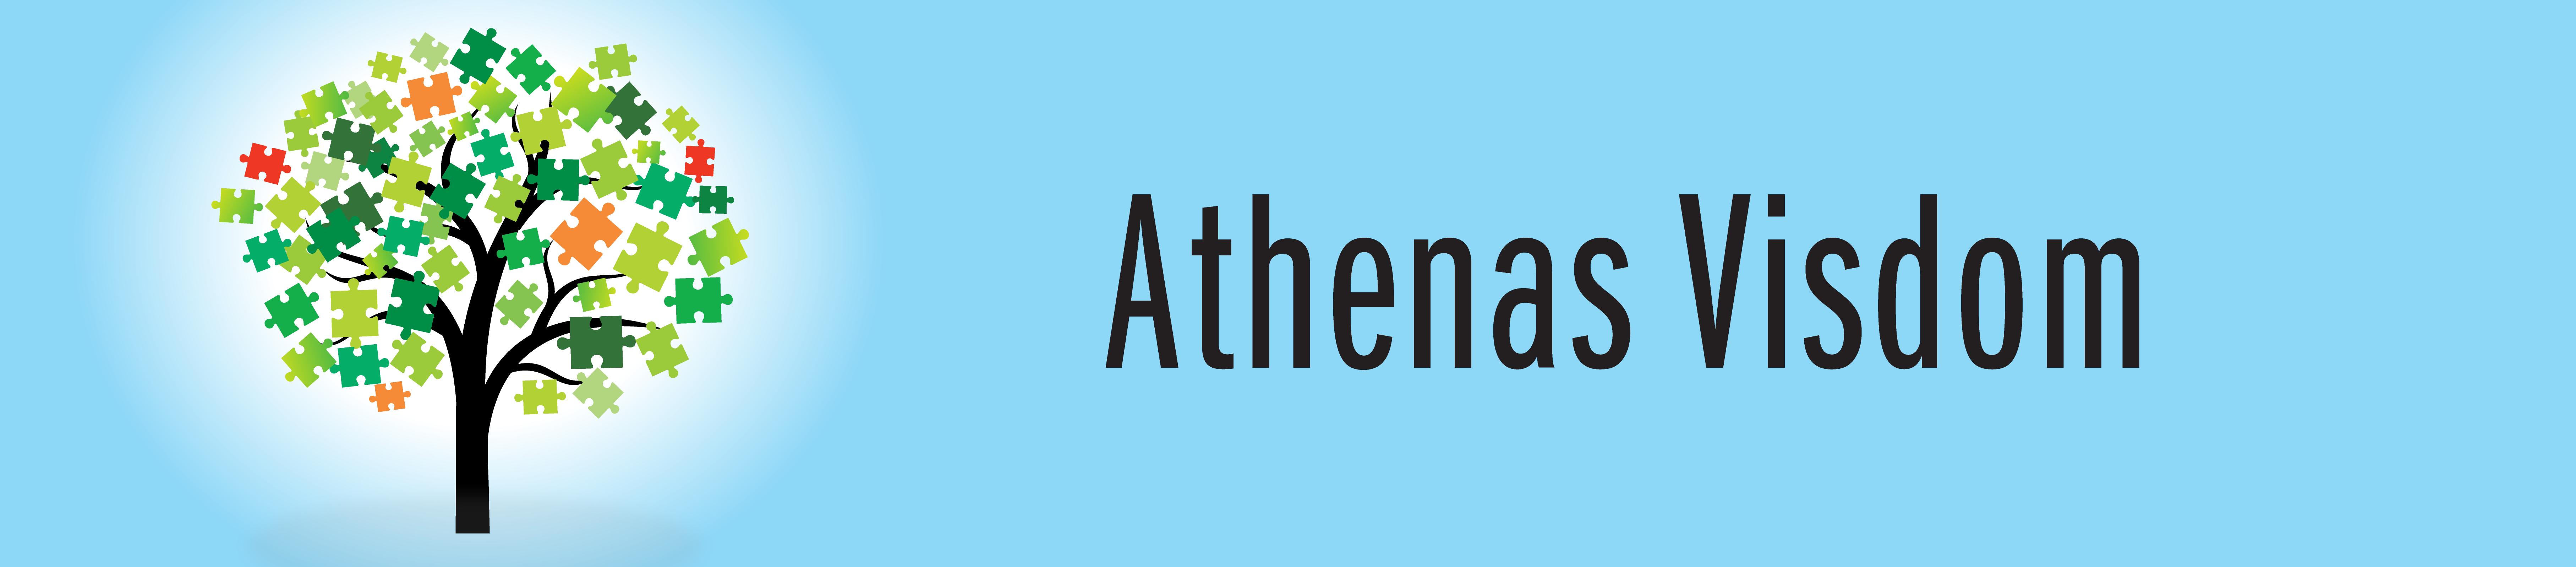 Athenas-Visdom_Linkedin_web_udenArtboard 1xhdpi